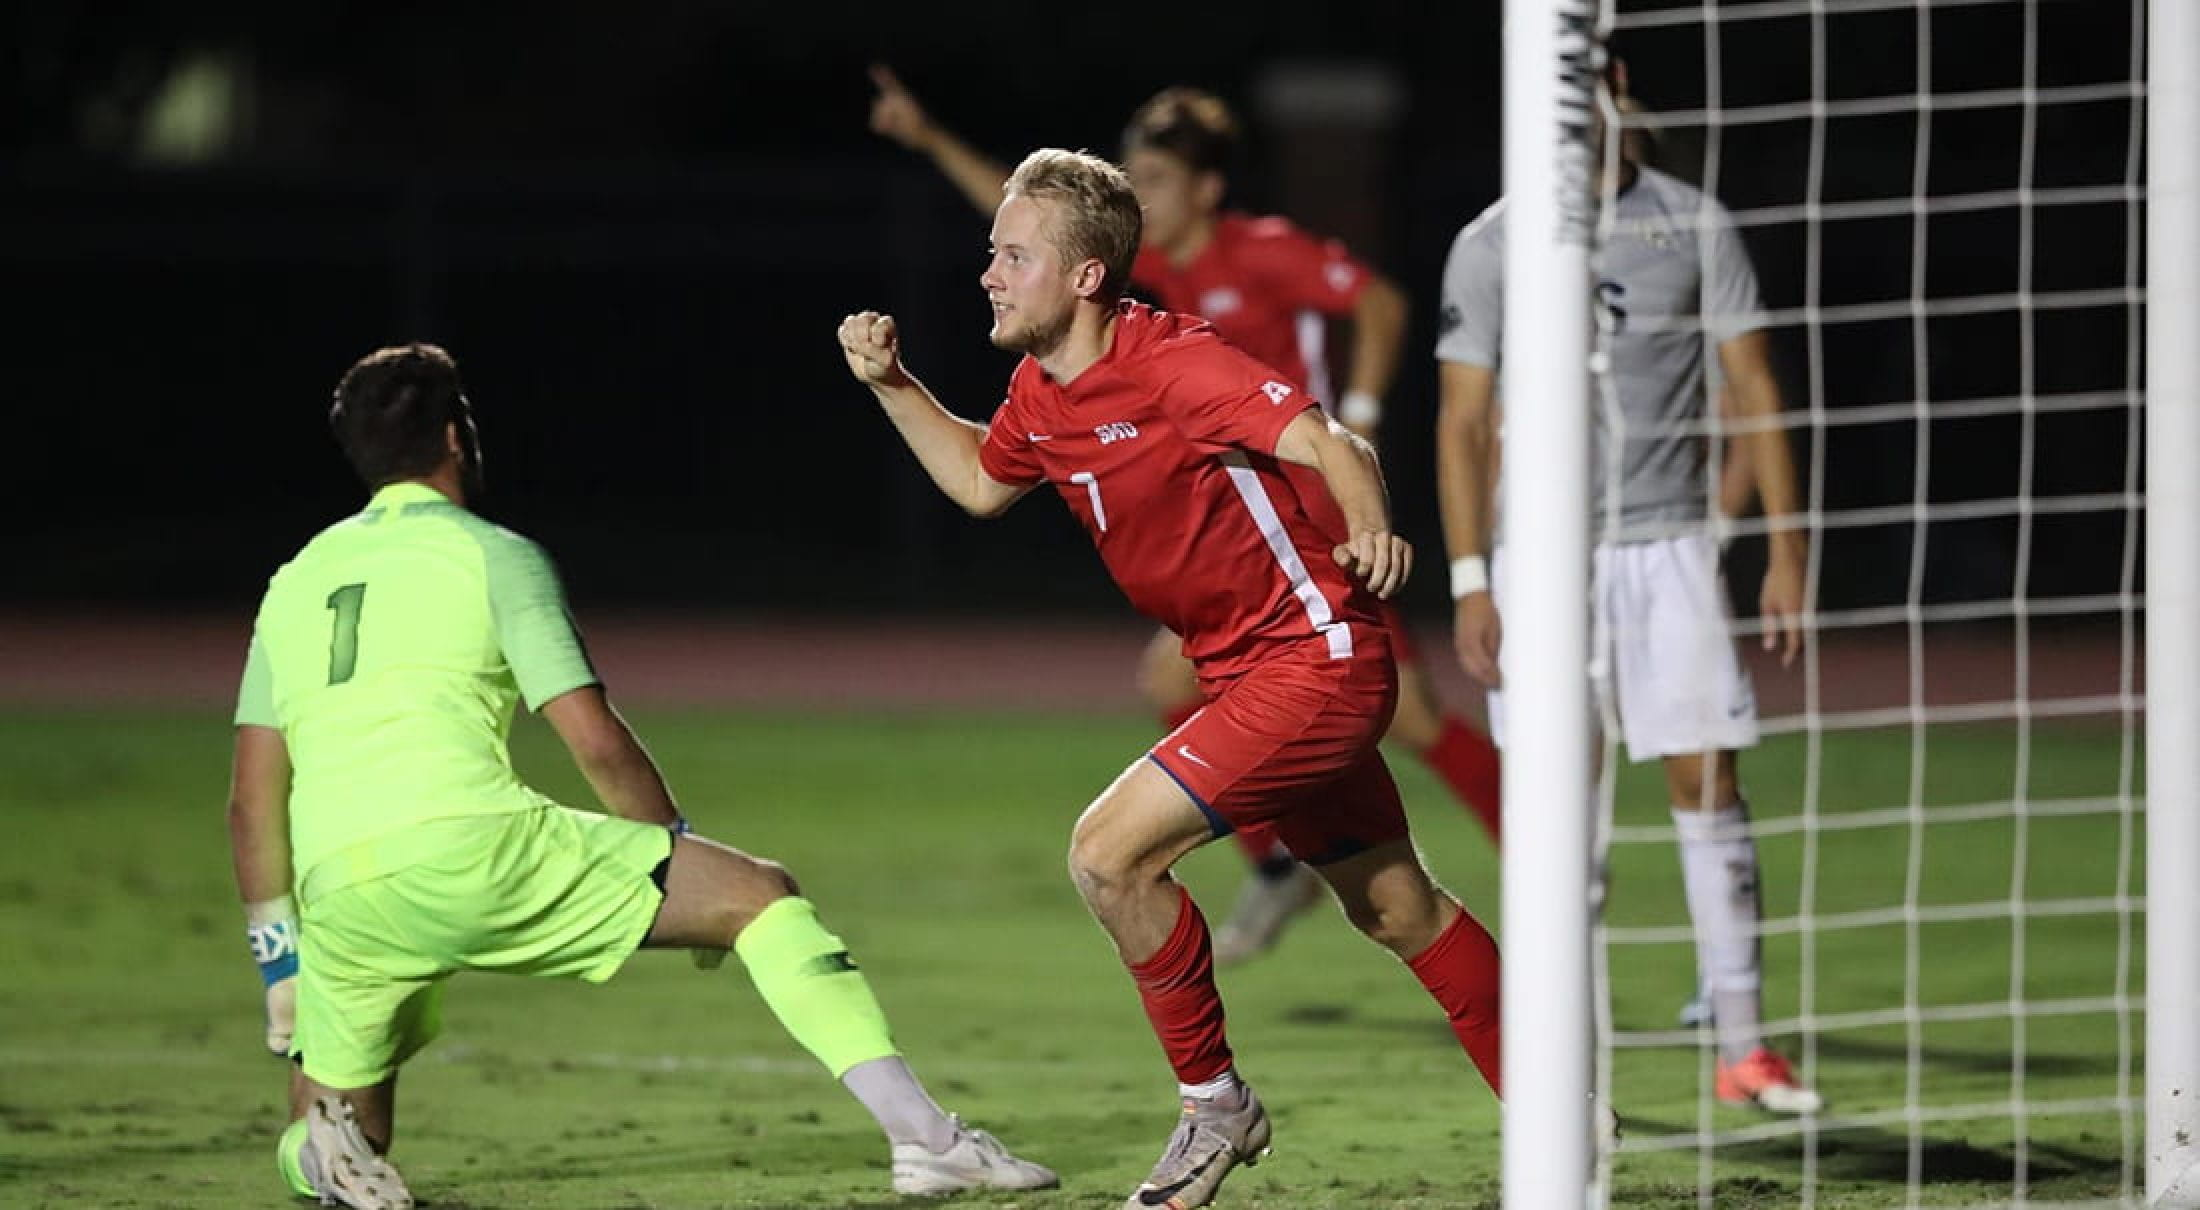 SMU soccer forward Garrett McLaughlin is finalist for national award